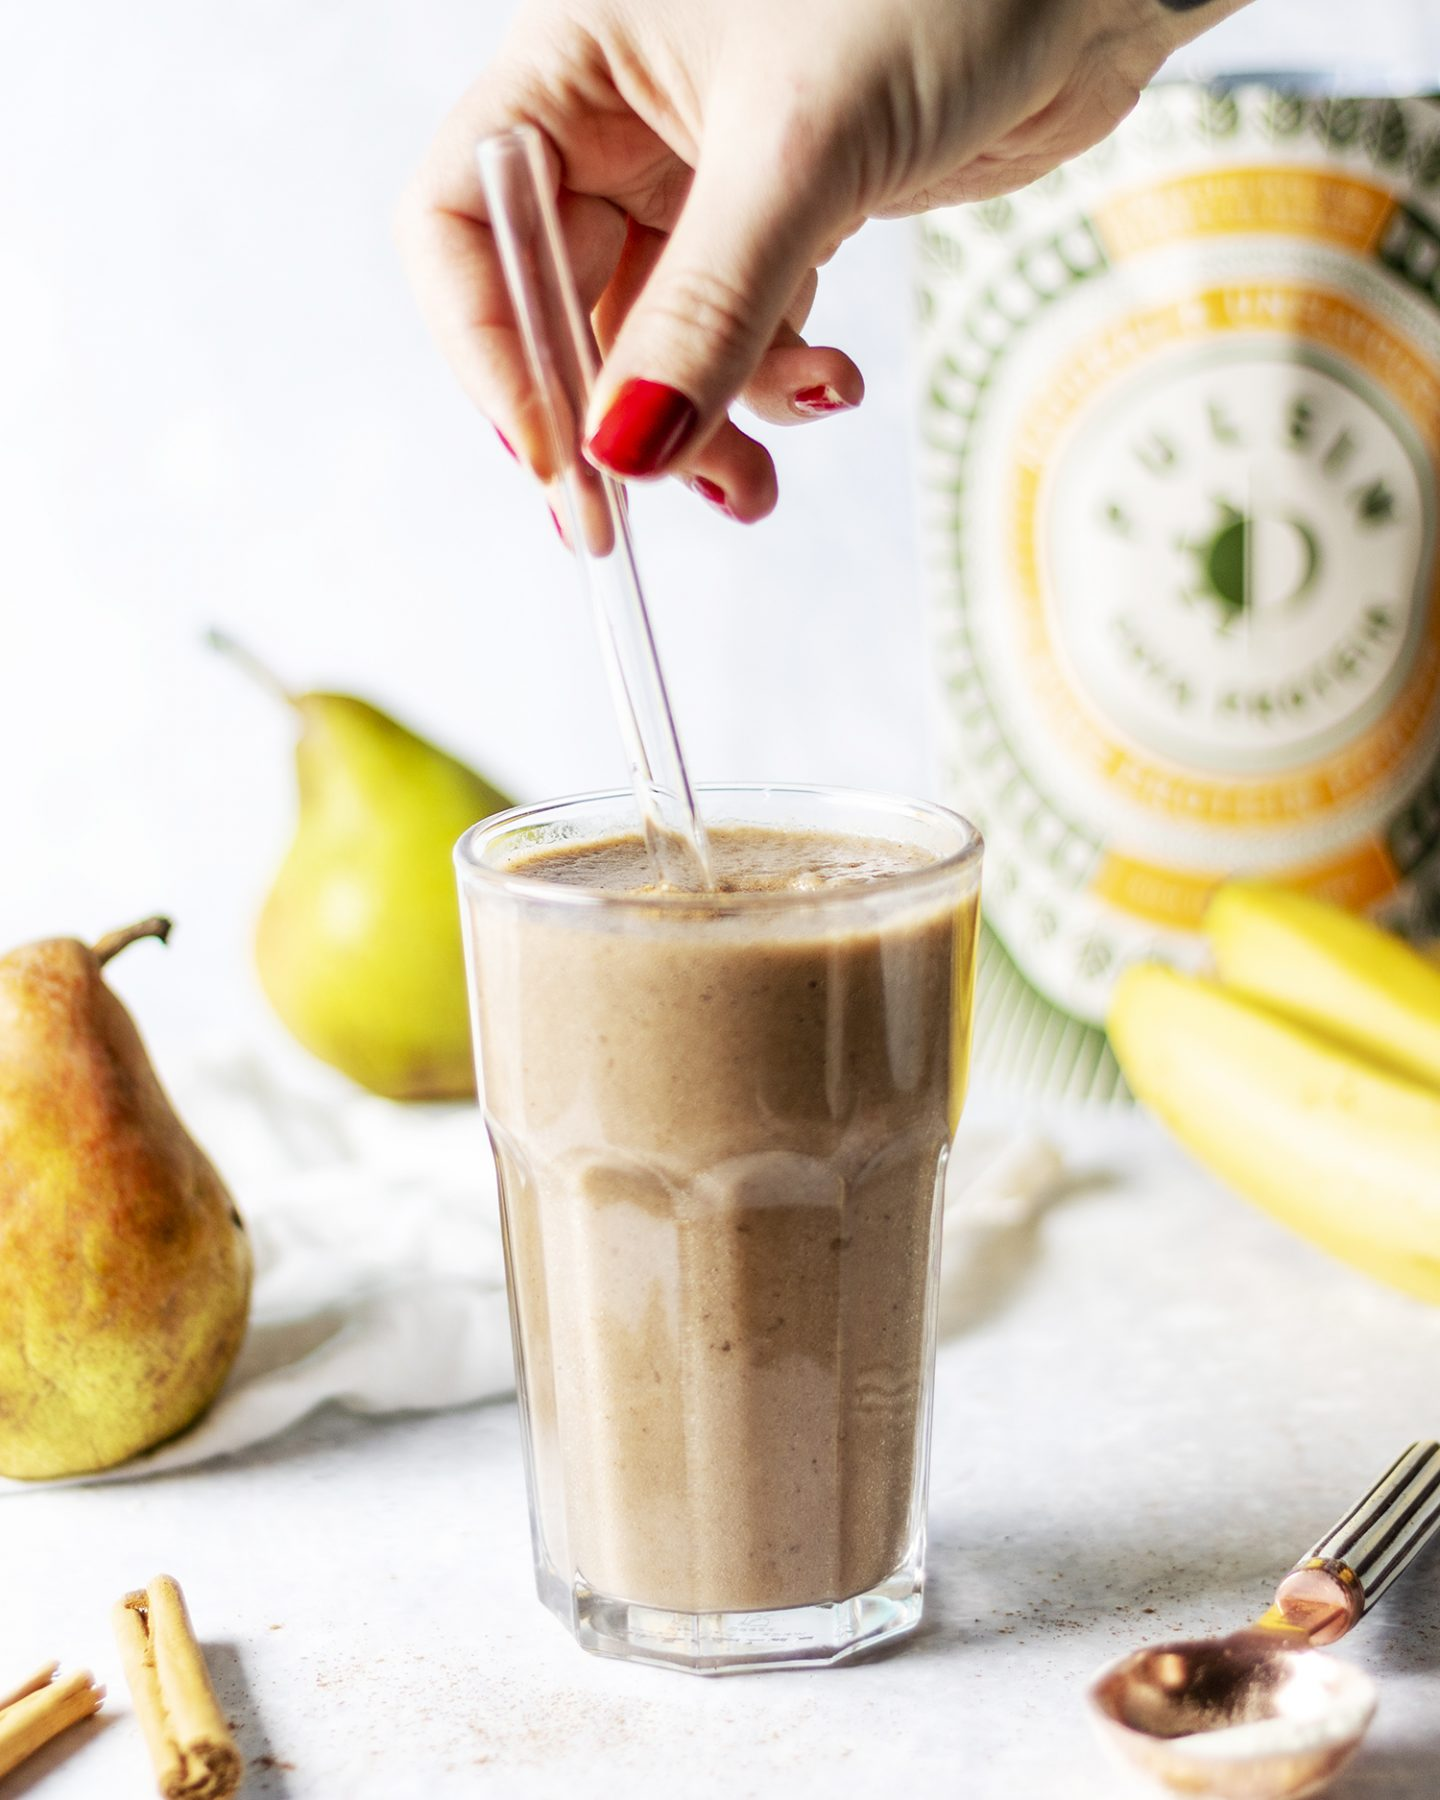 Pear & Cinnamon Smoothie (Vegan)